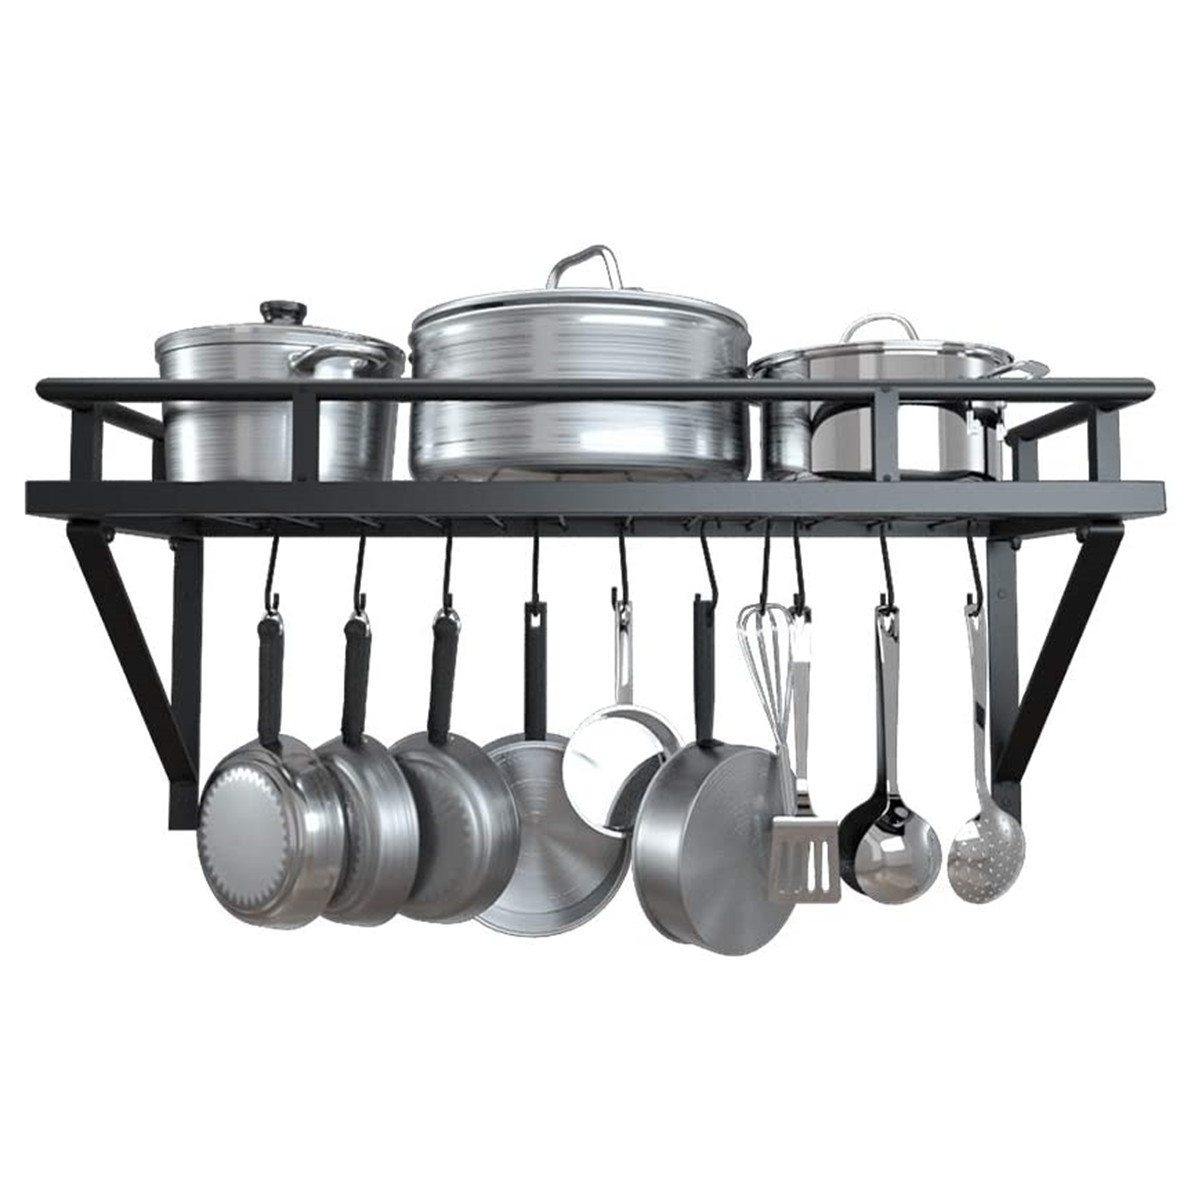 black wall pot rack kitchen wall mount pot pan rack with hooks pots and pan rack decorative wall mounted storage hanging rack iron shelf organizer for